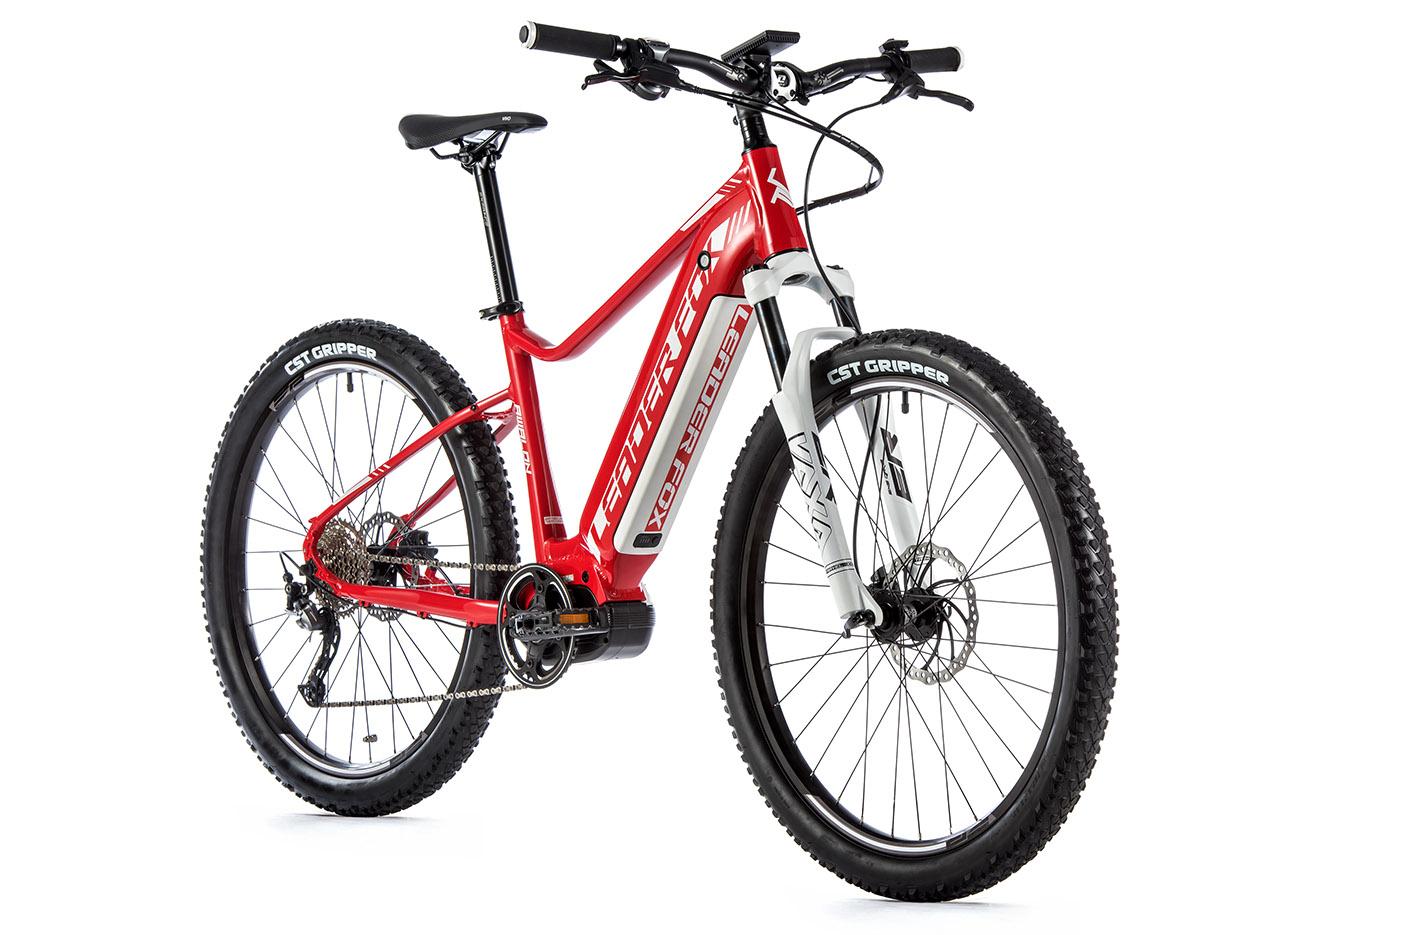 Bicicleta electrica MTB Leader Fox Awalon Gent 27.5 inch, 2020